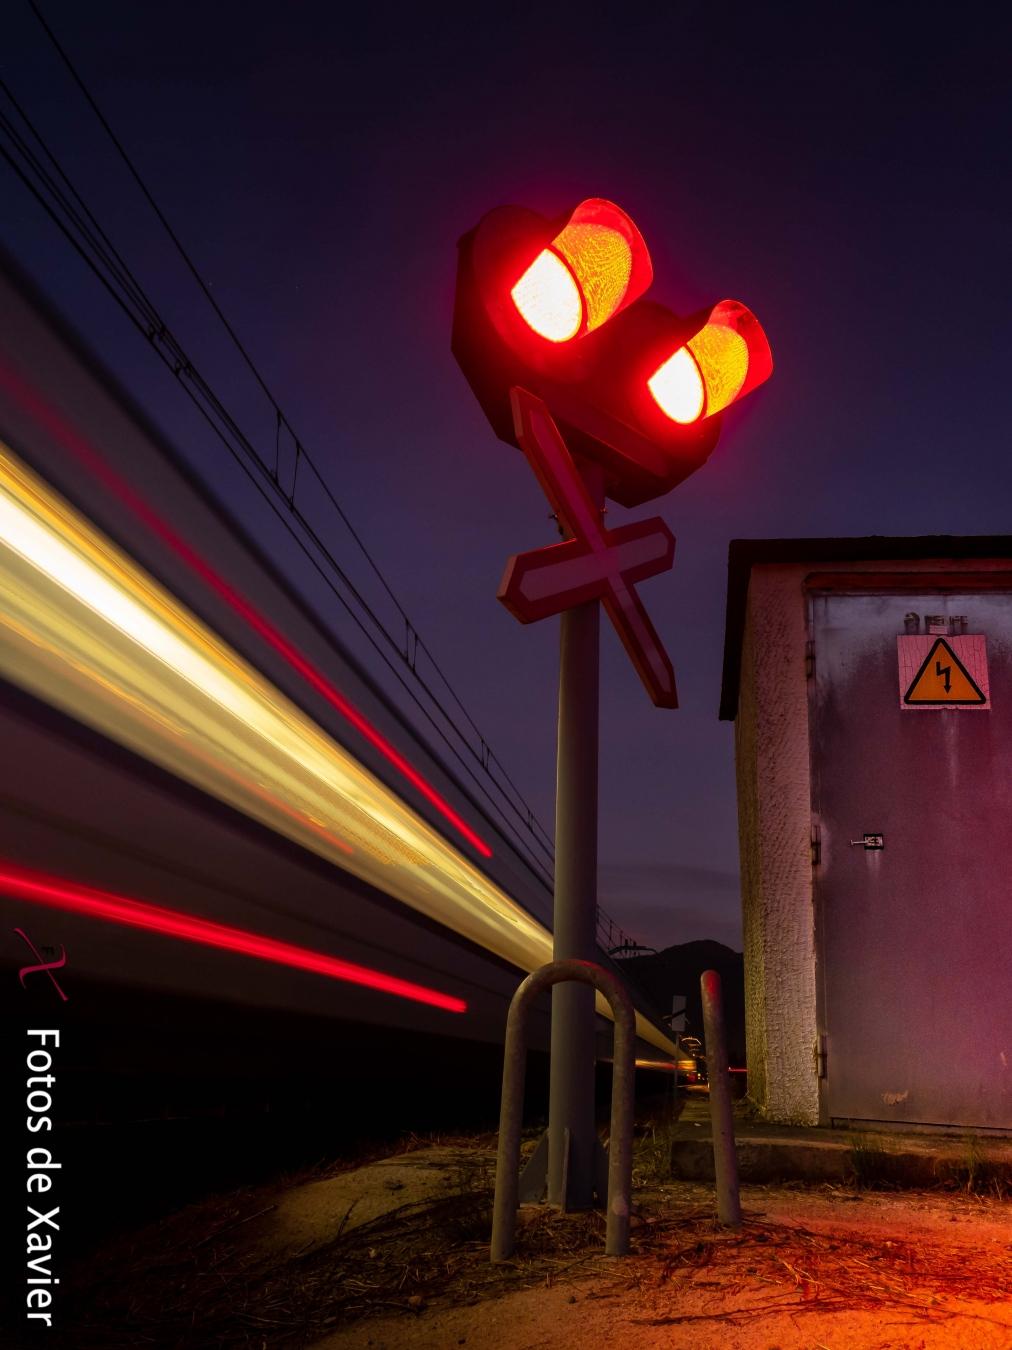 Dangerous - Luz - Fotos de Xavier. Fotografia de naturaleza y paisaje. Xavier Linares